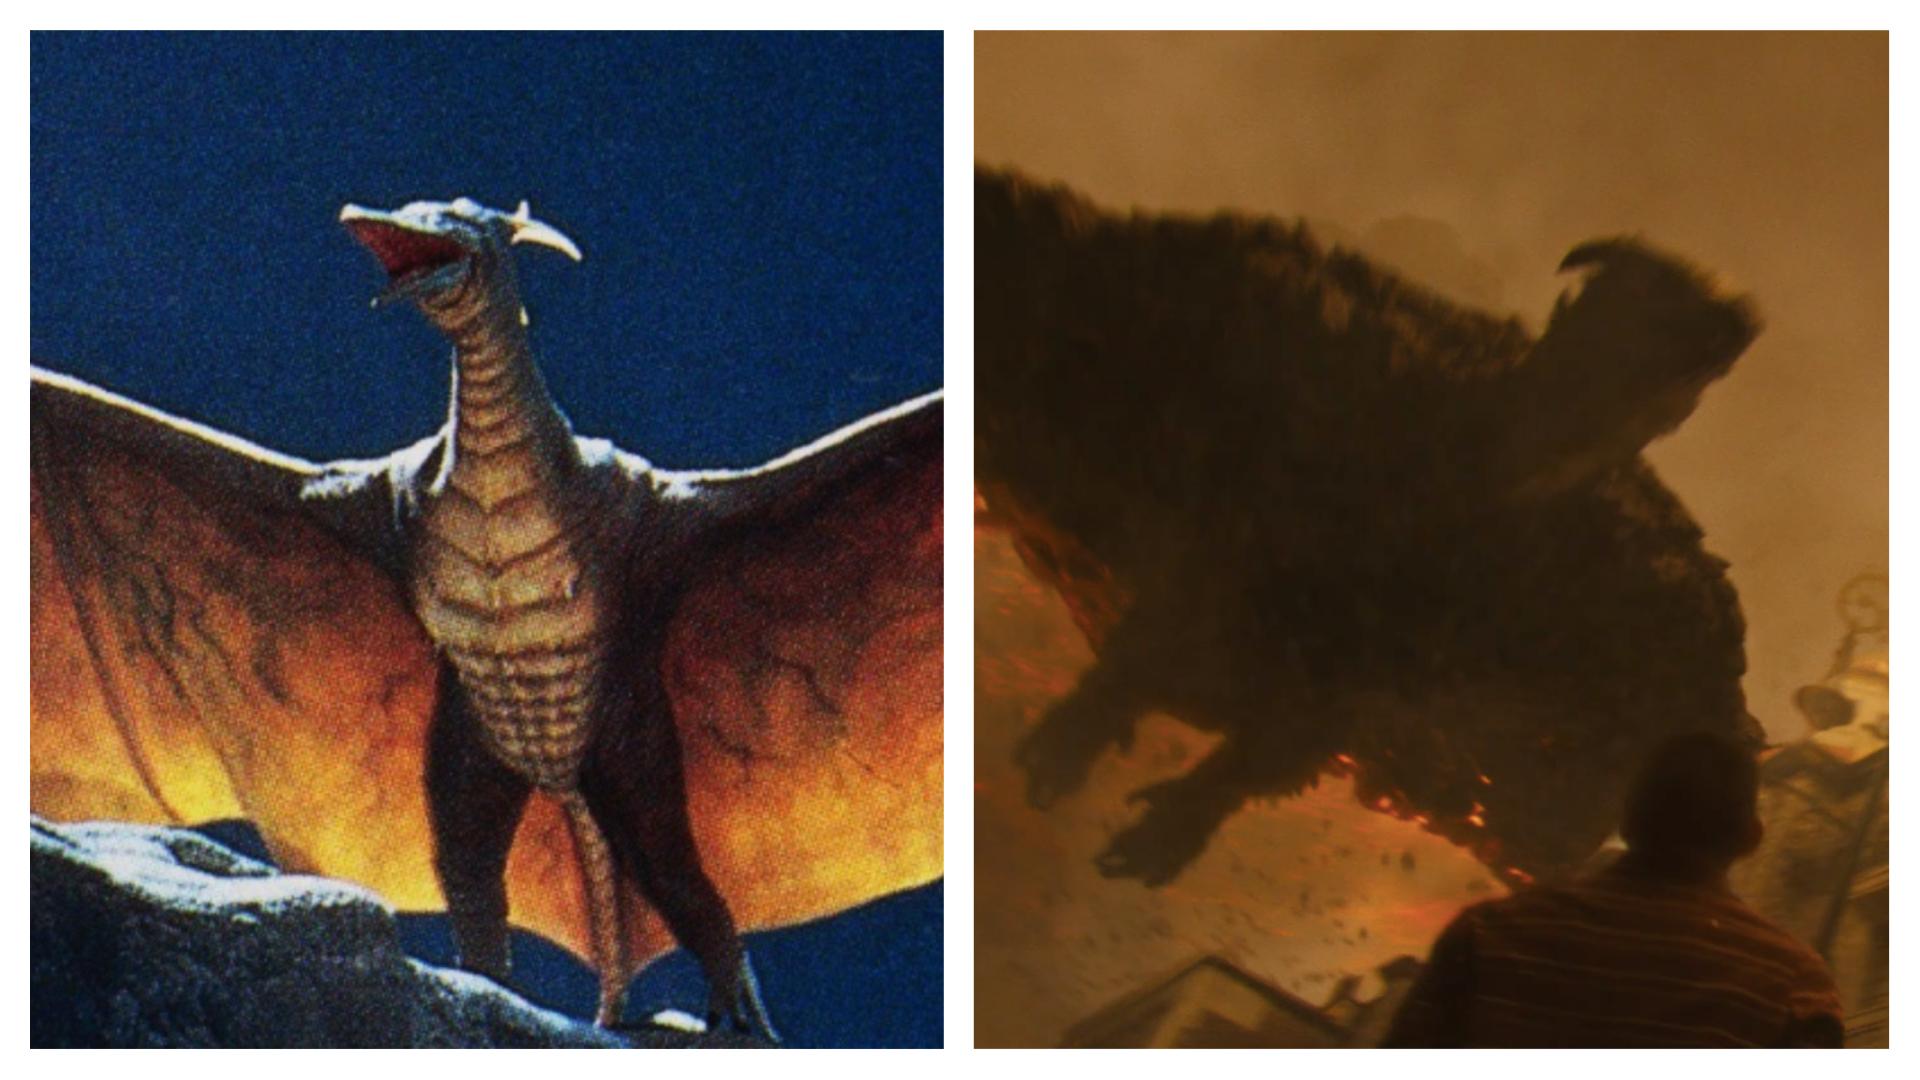 19ae8227166 'Godzilla King of the Monsters' Trailer 2 Shows Rodan, Mothra, King Ghidora  | Inverse